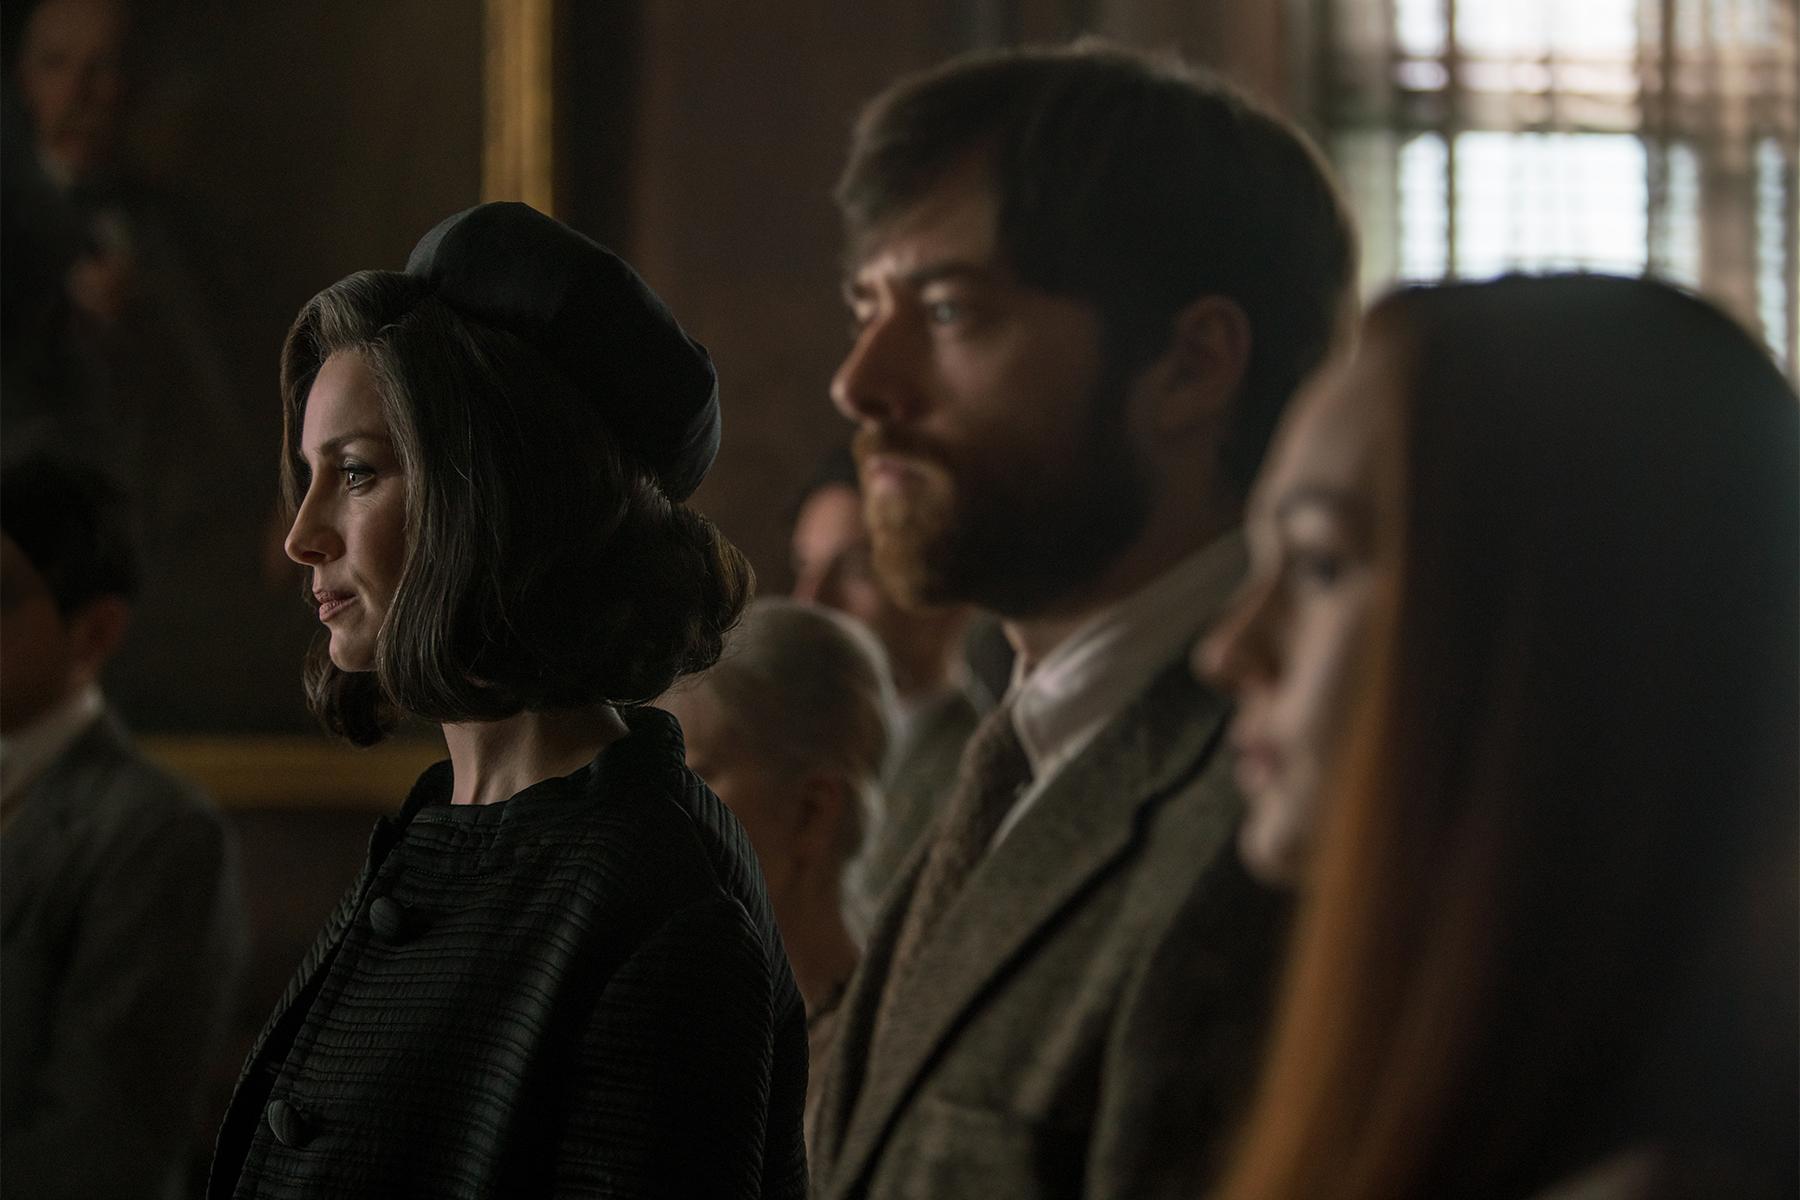 Caitriona Balfe (Claire Randall Fraser), Sophie Skelton (Brianna Randall) and Richard Rankin (Roger Wakefield)